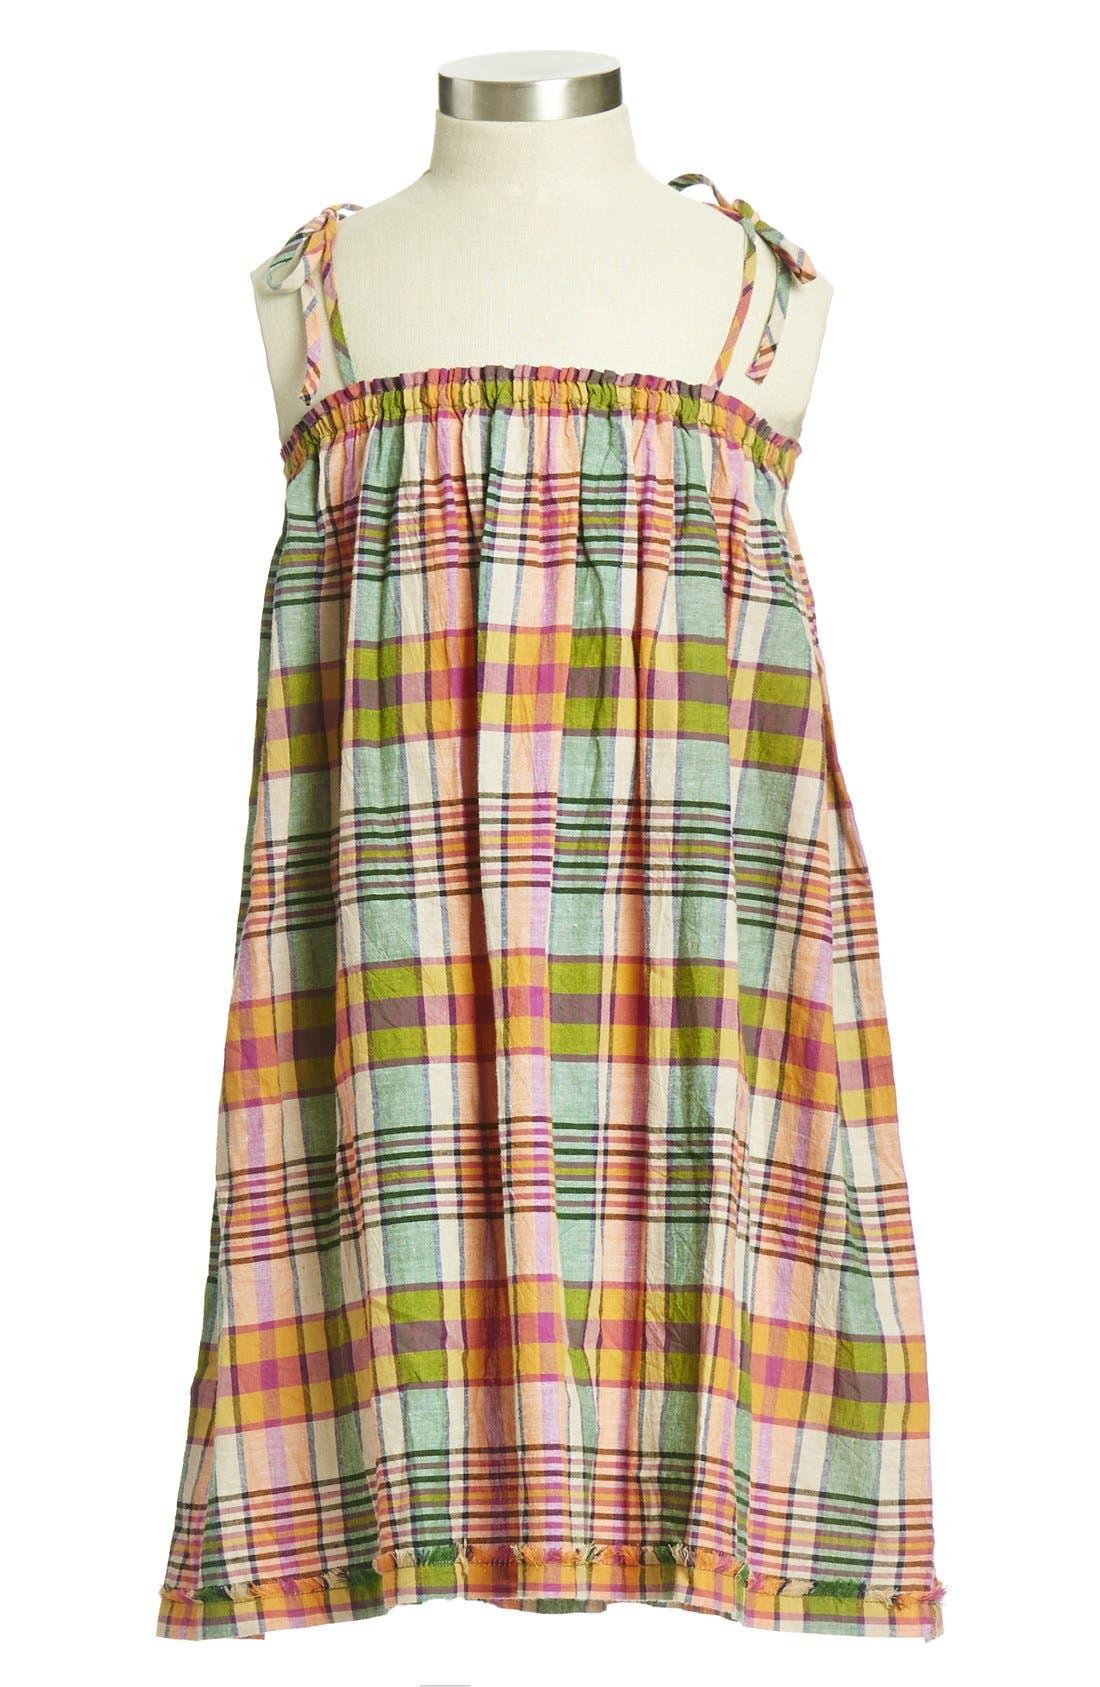 Main Image - Peek 'Collette' Plaid Cotton Dress (Toddler Girls, Little Girls & Big Girls)